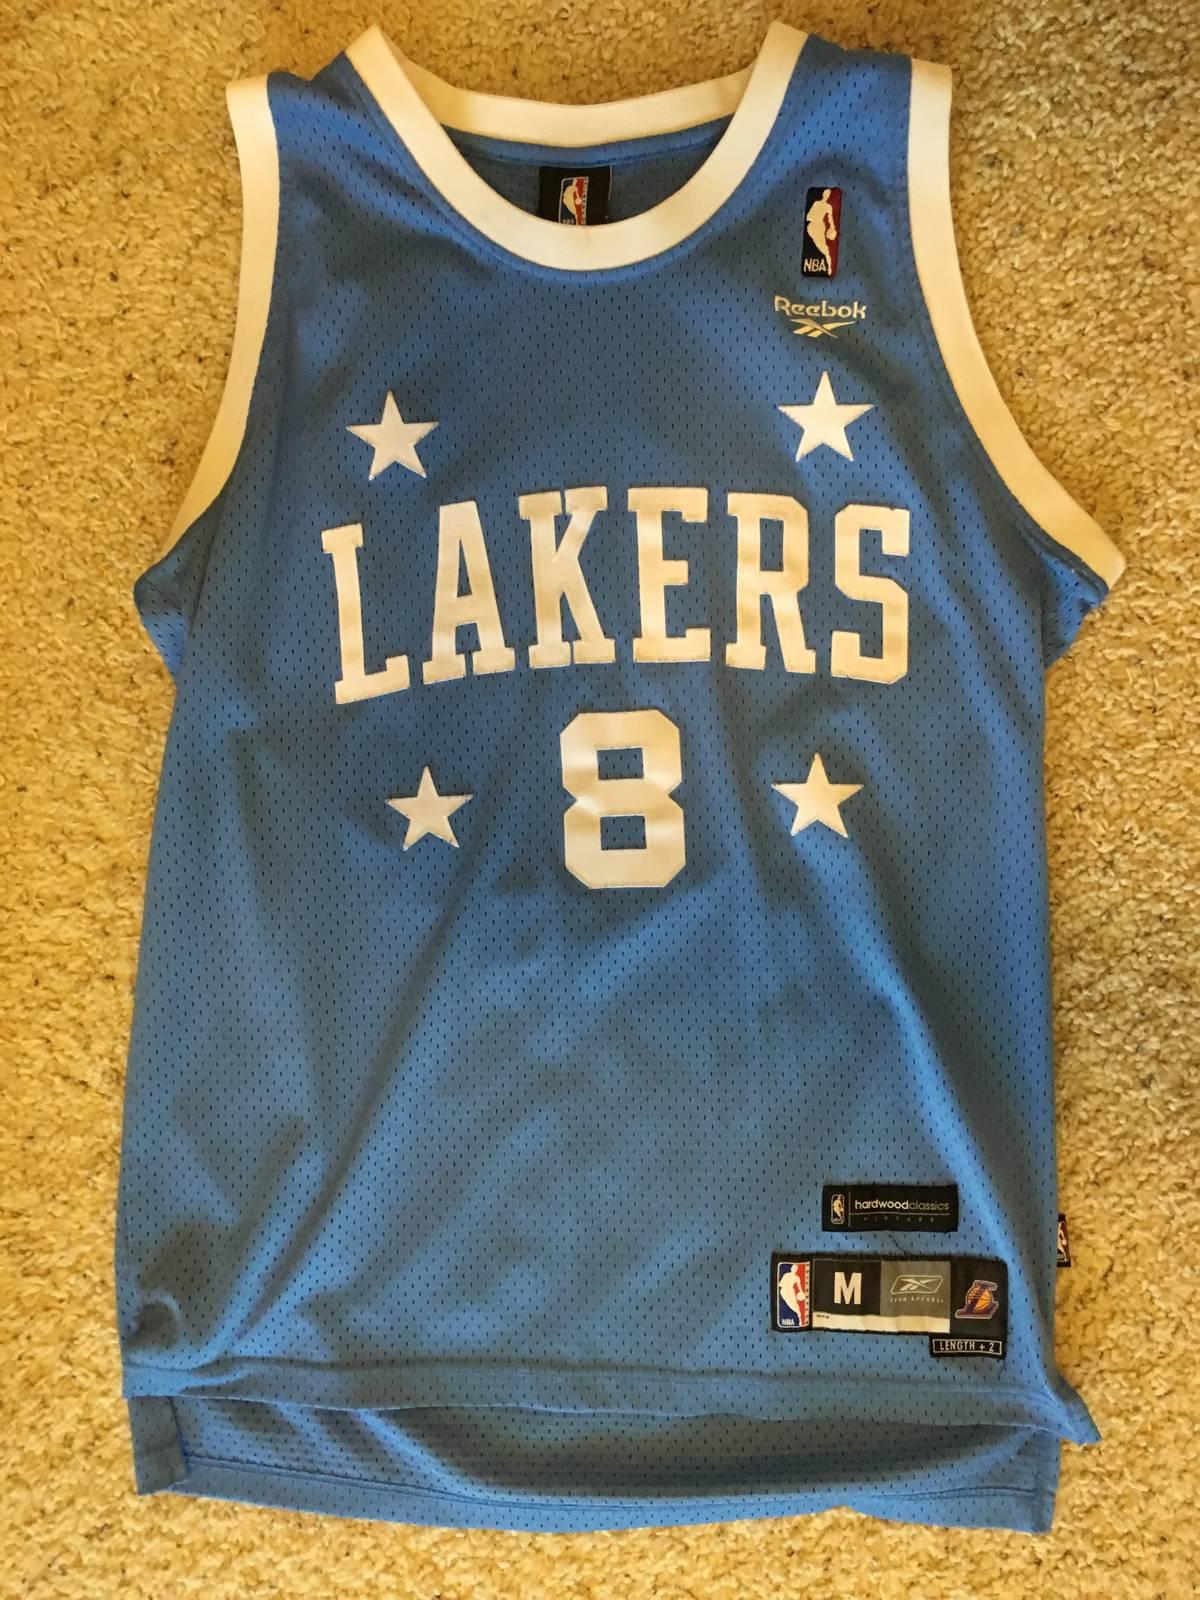 Reebok Retro Vintage Kobe Bryant MPLS Laker Jersey Size m - Jerseys for  Sale - Grailed 51537fdef